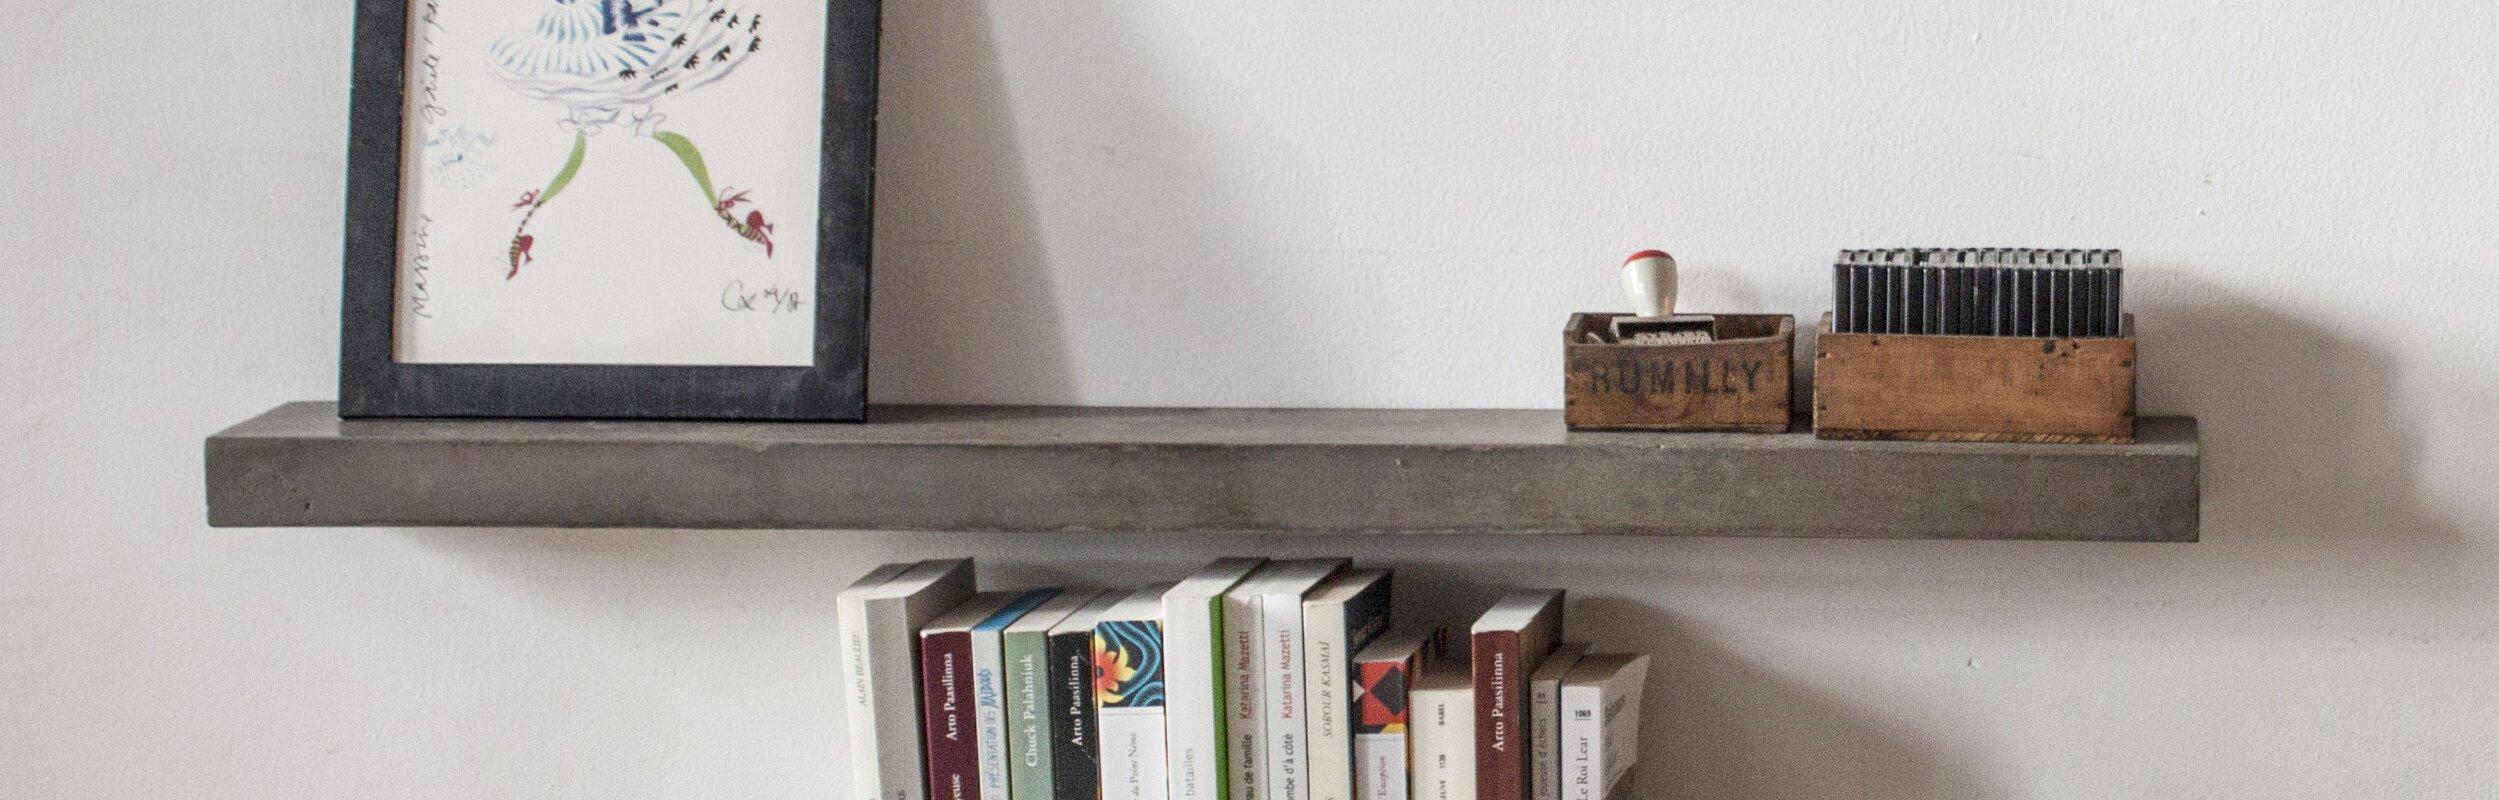 Floating Shelf lyon beton sliced concrete floating shelf & reviews | wayfair